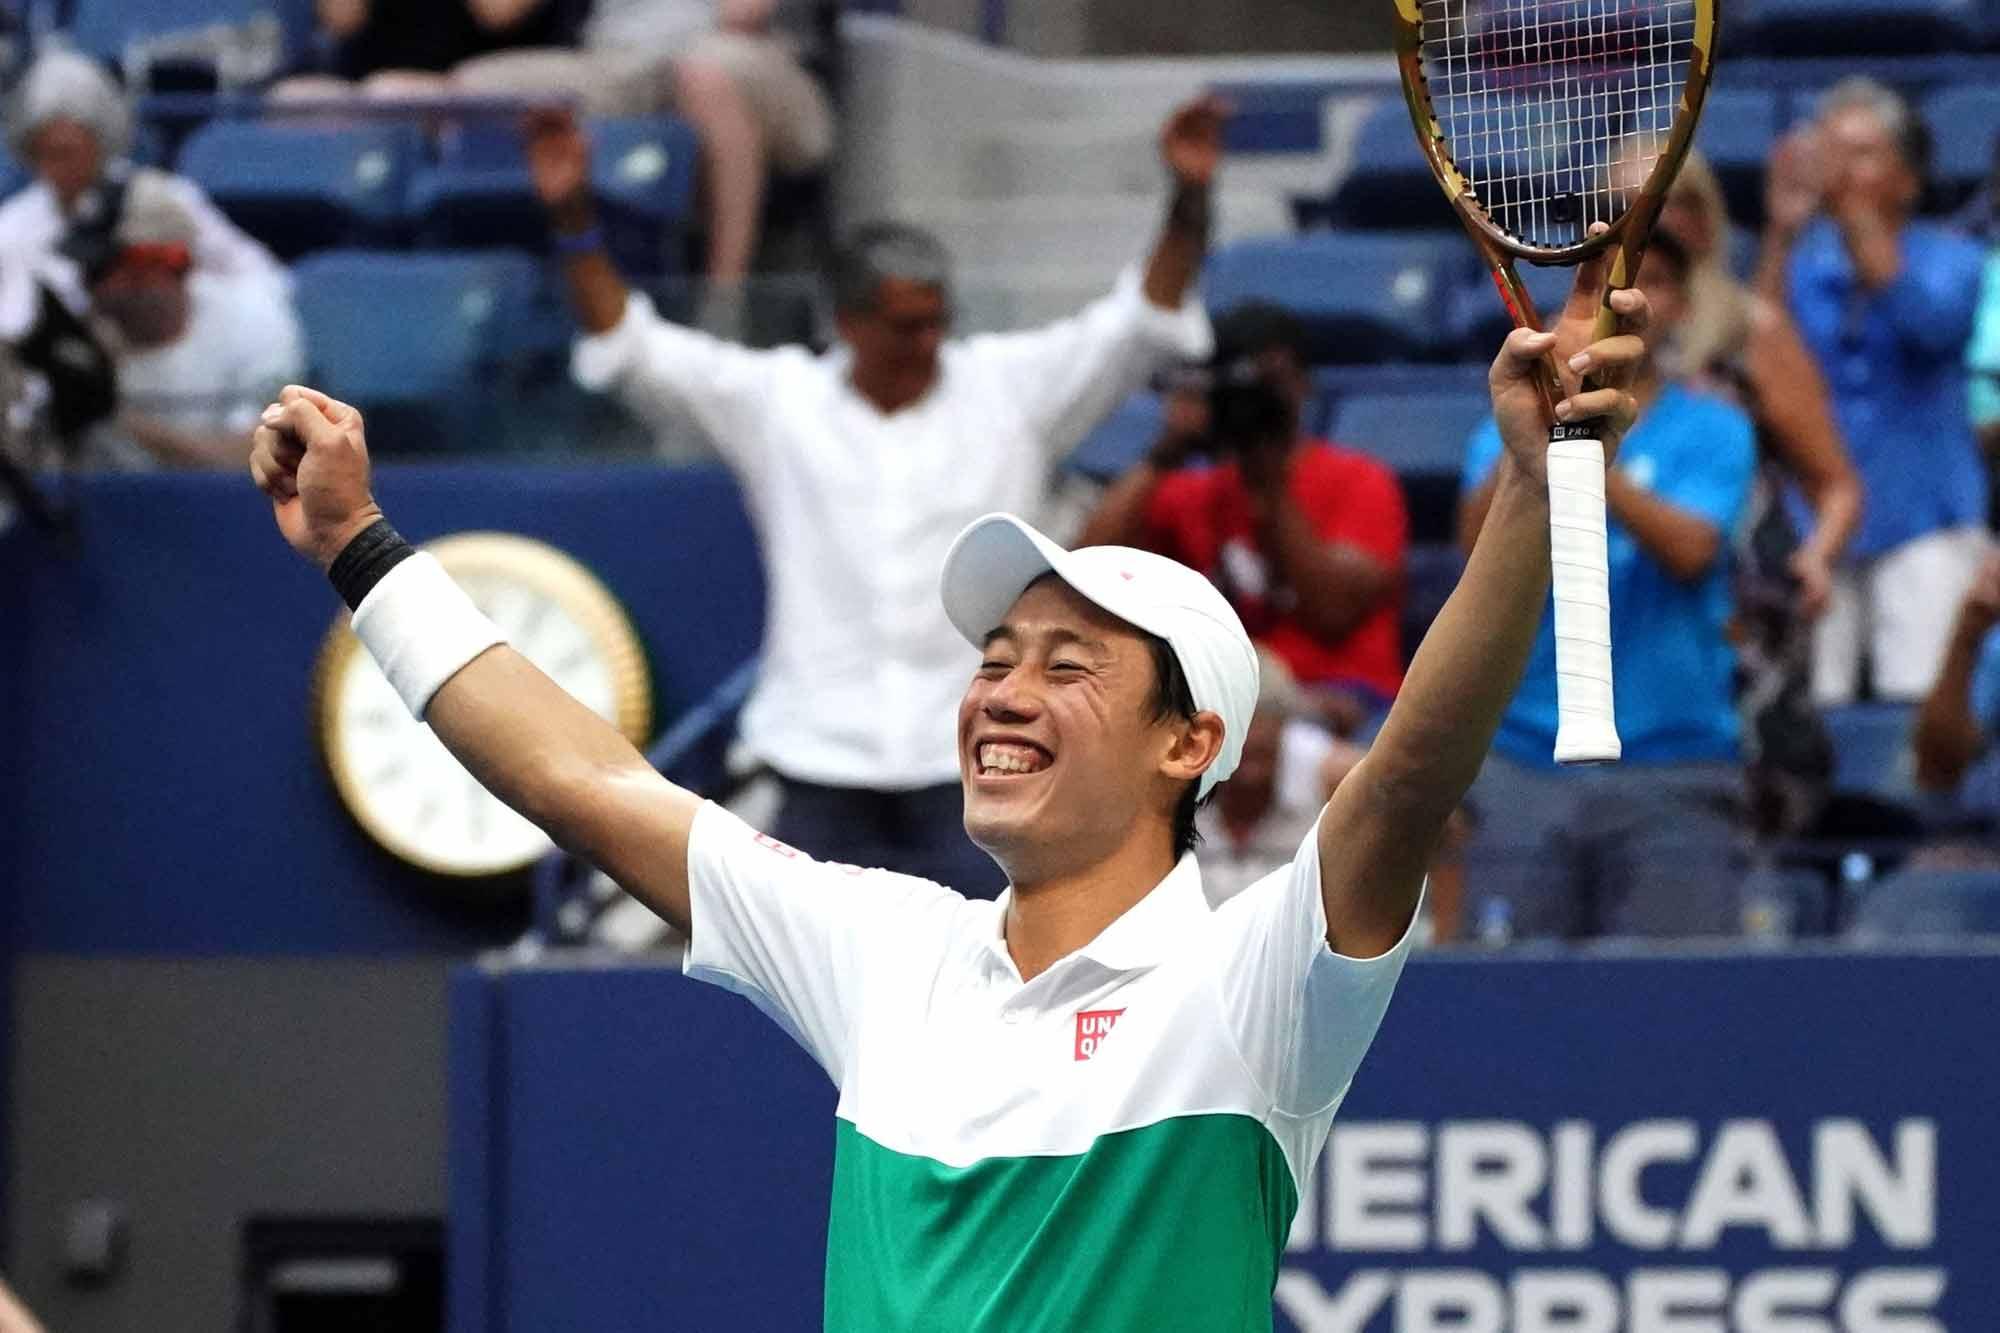 Kei Nishikori se vengó de Marin Cilic e hizo historia en el US Open